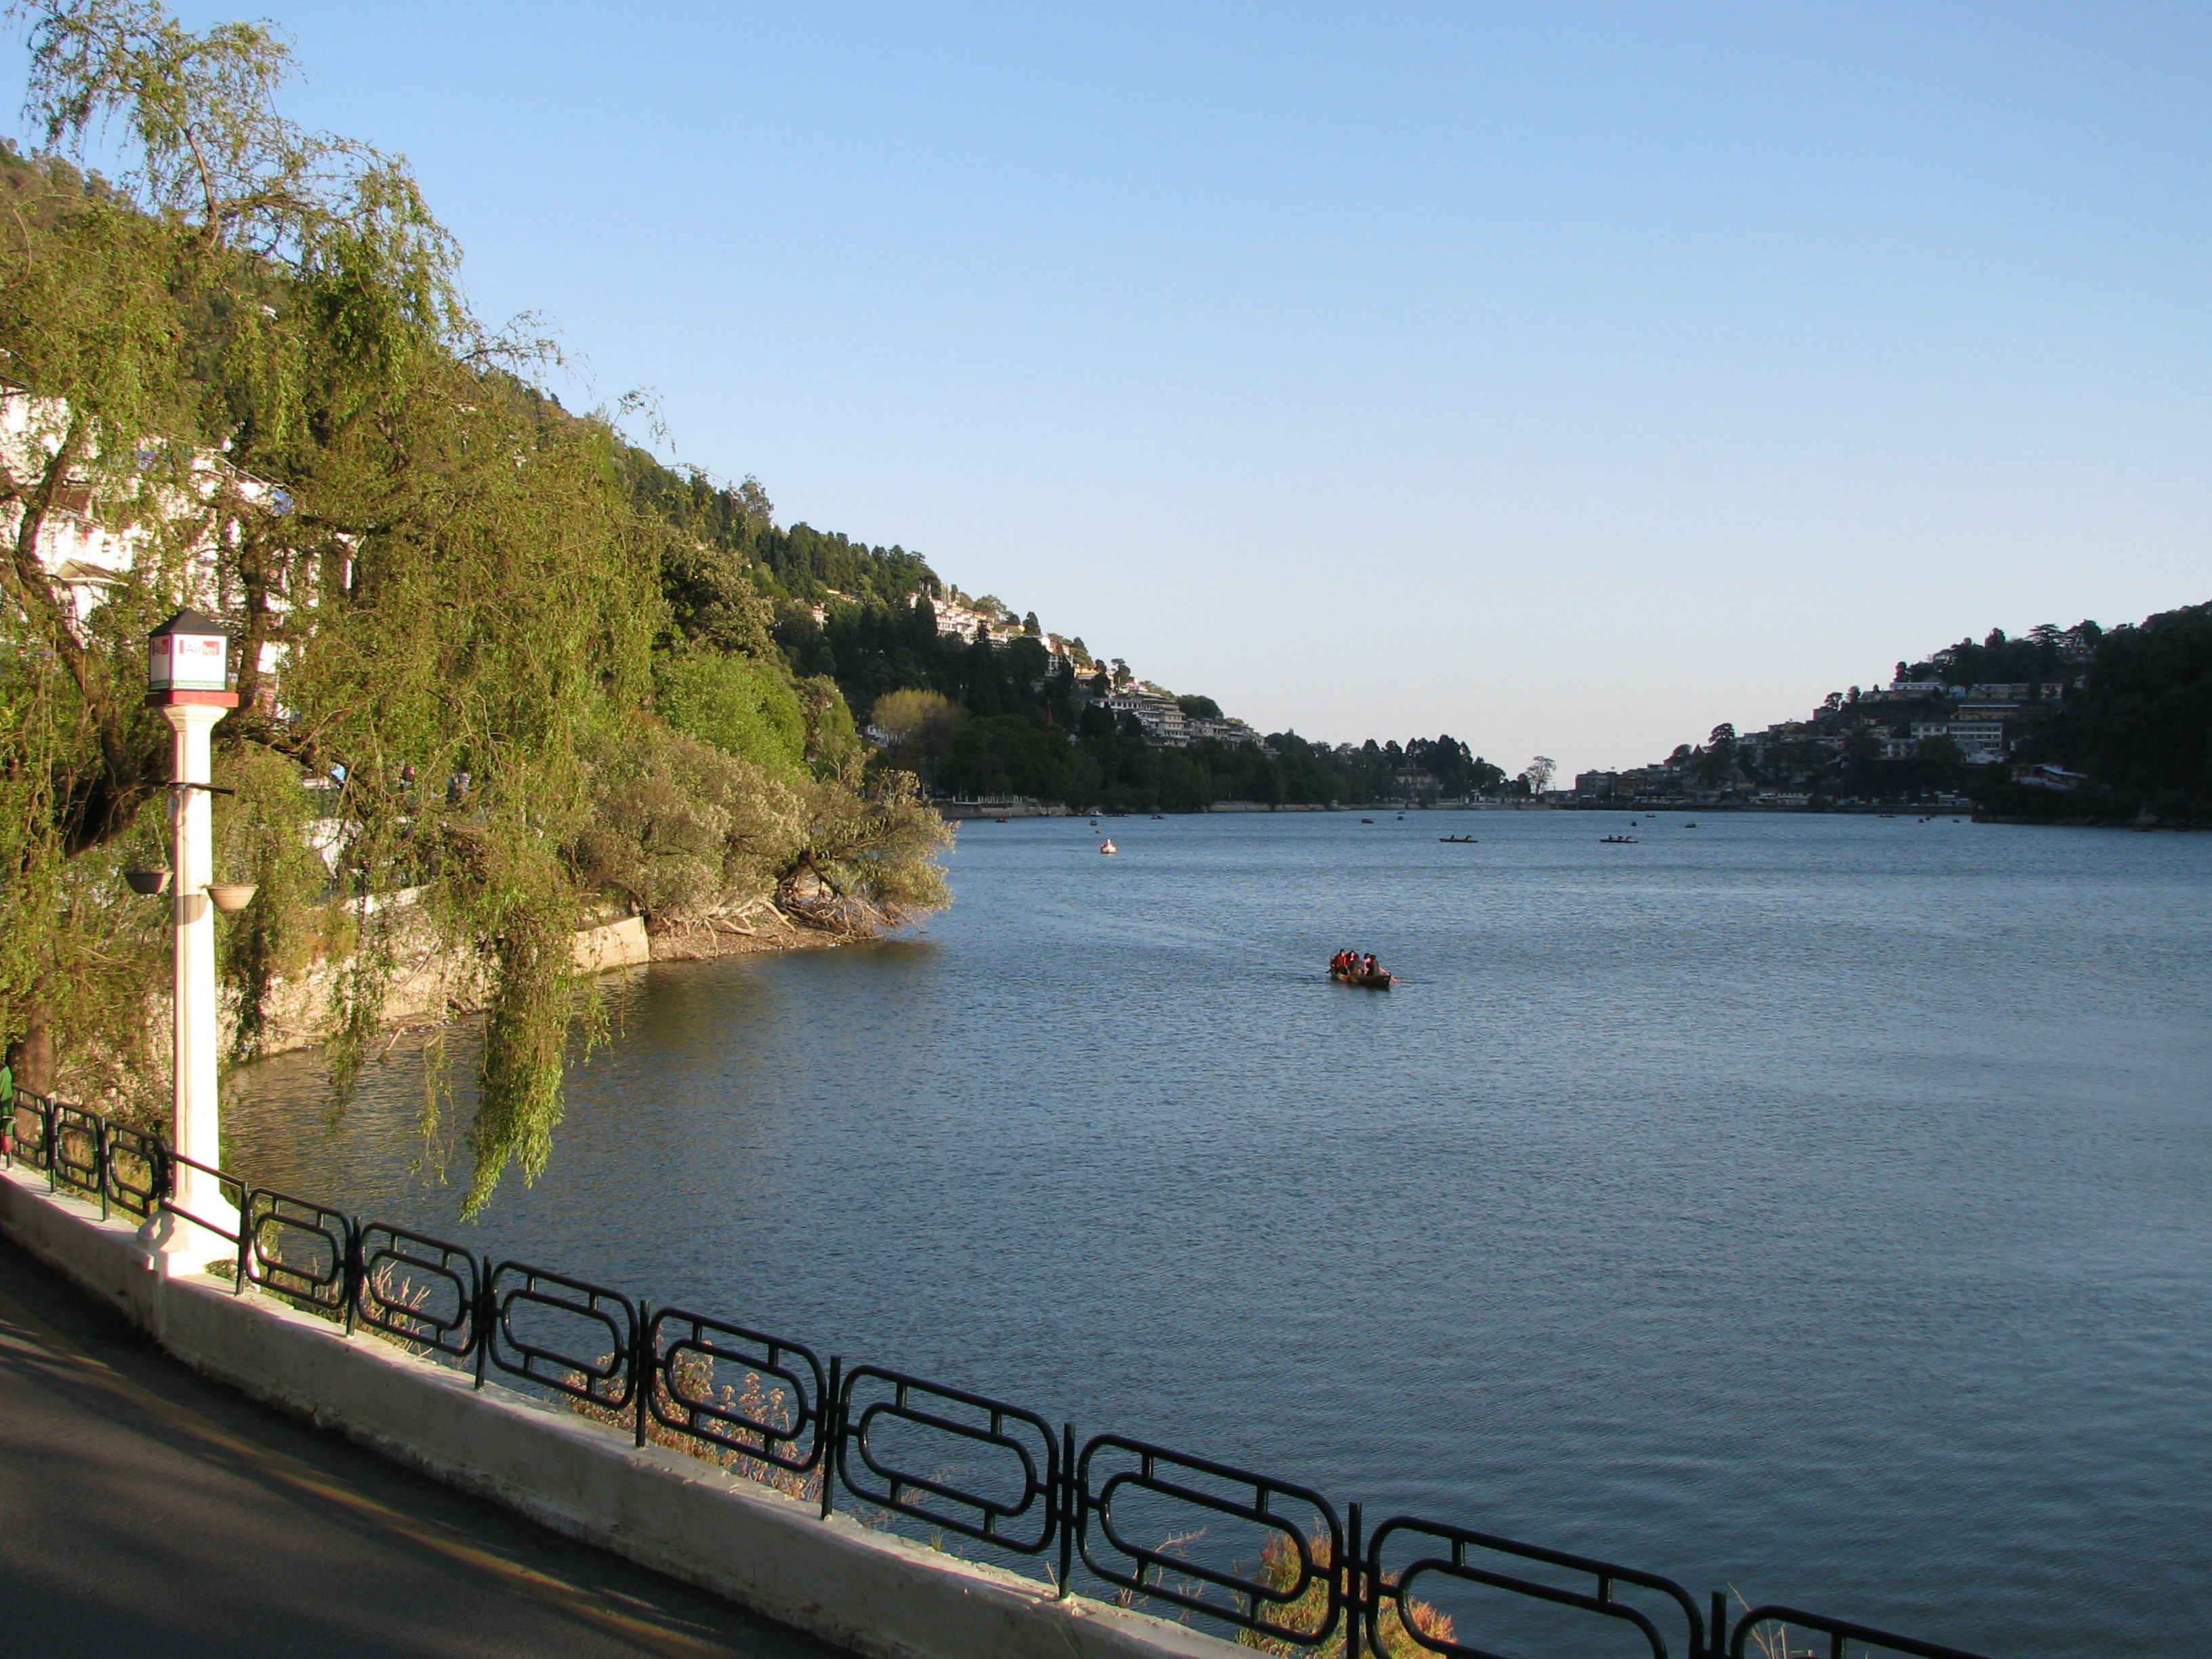 File:Nainital Lake, April, 2009.JPG - Wikimedia Commons